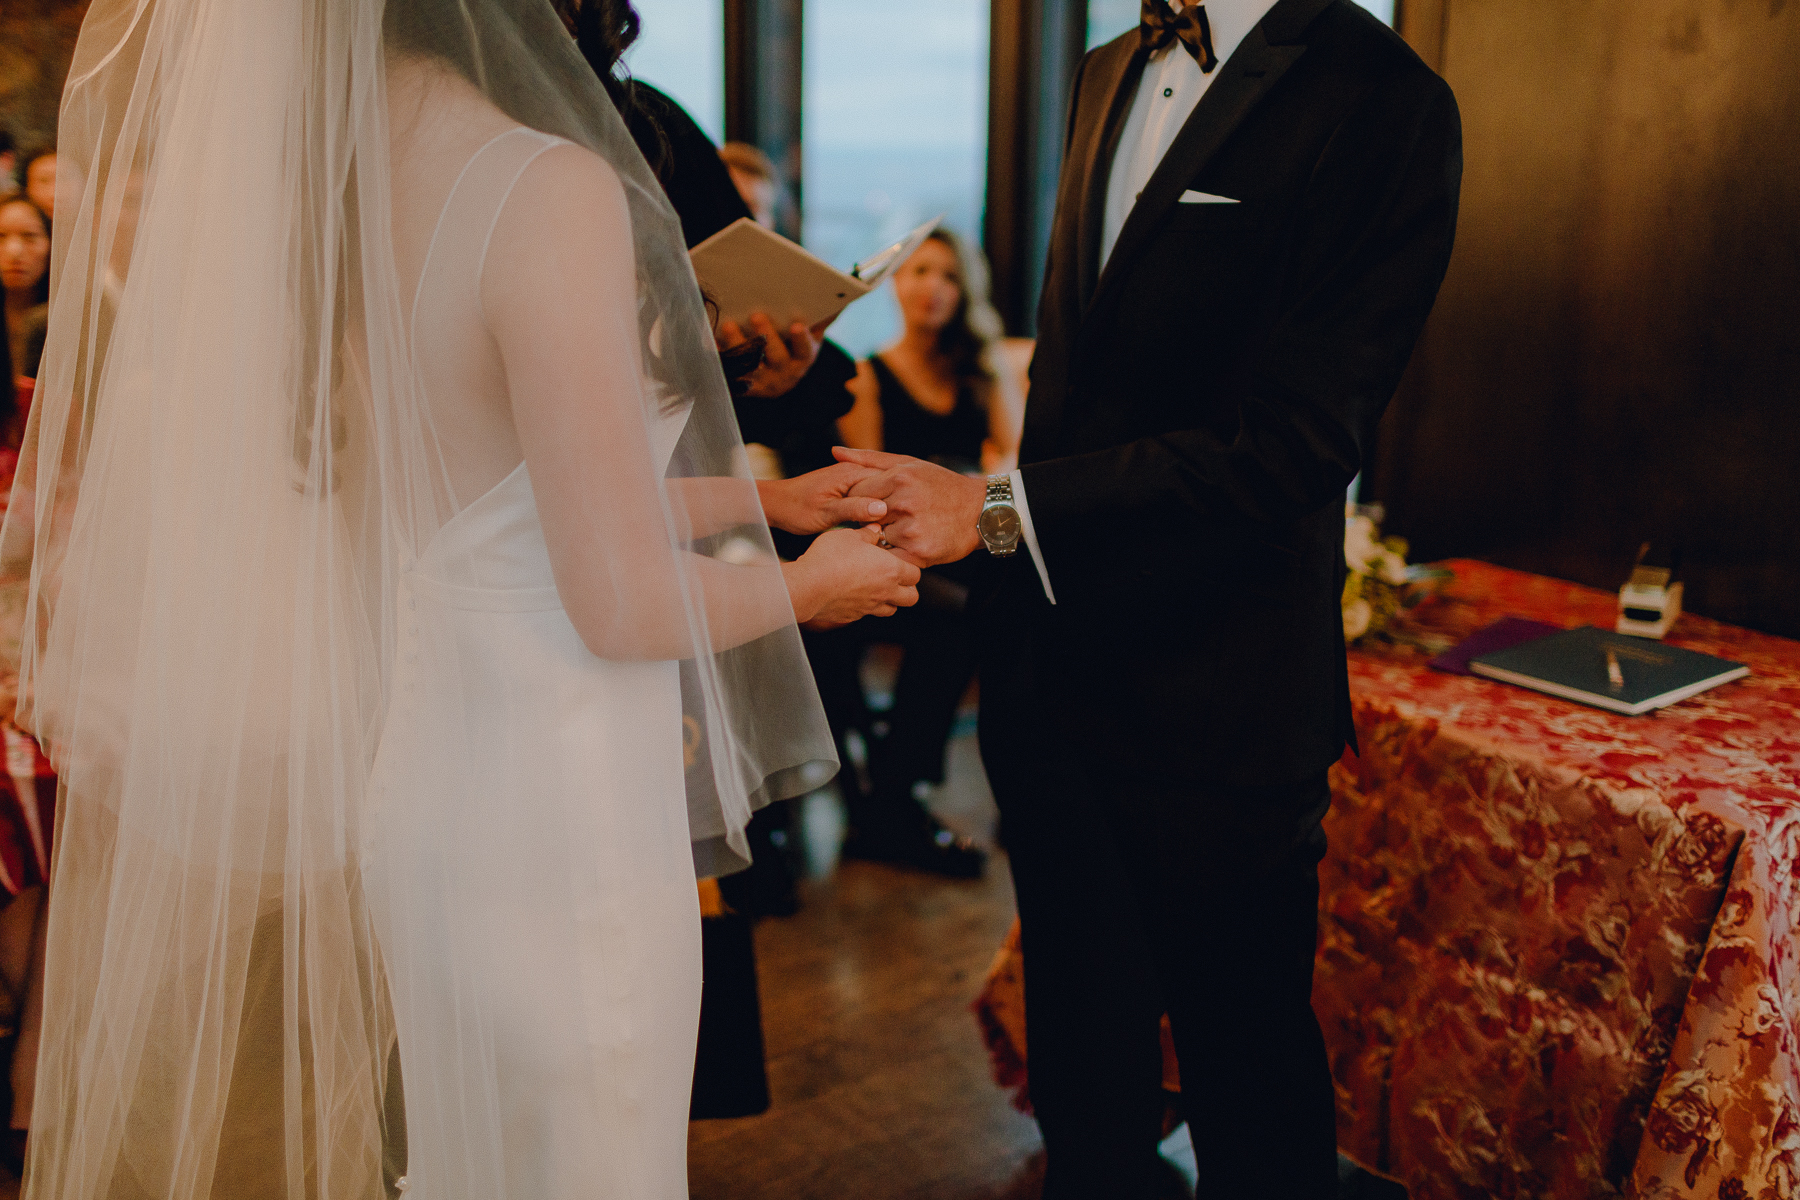 cannoe-restaurannt-wedding 0056.jpg